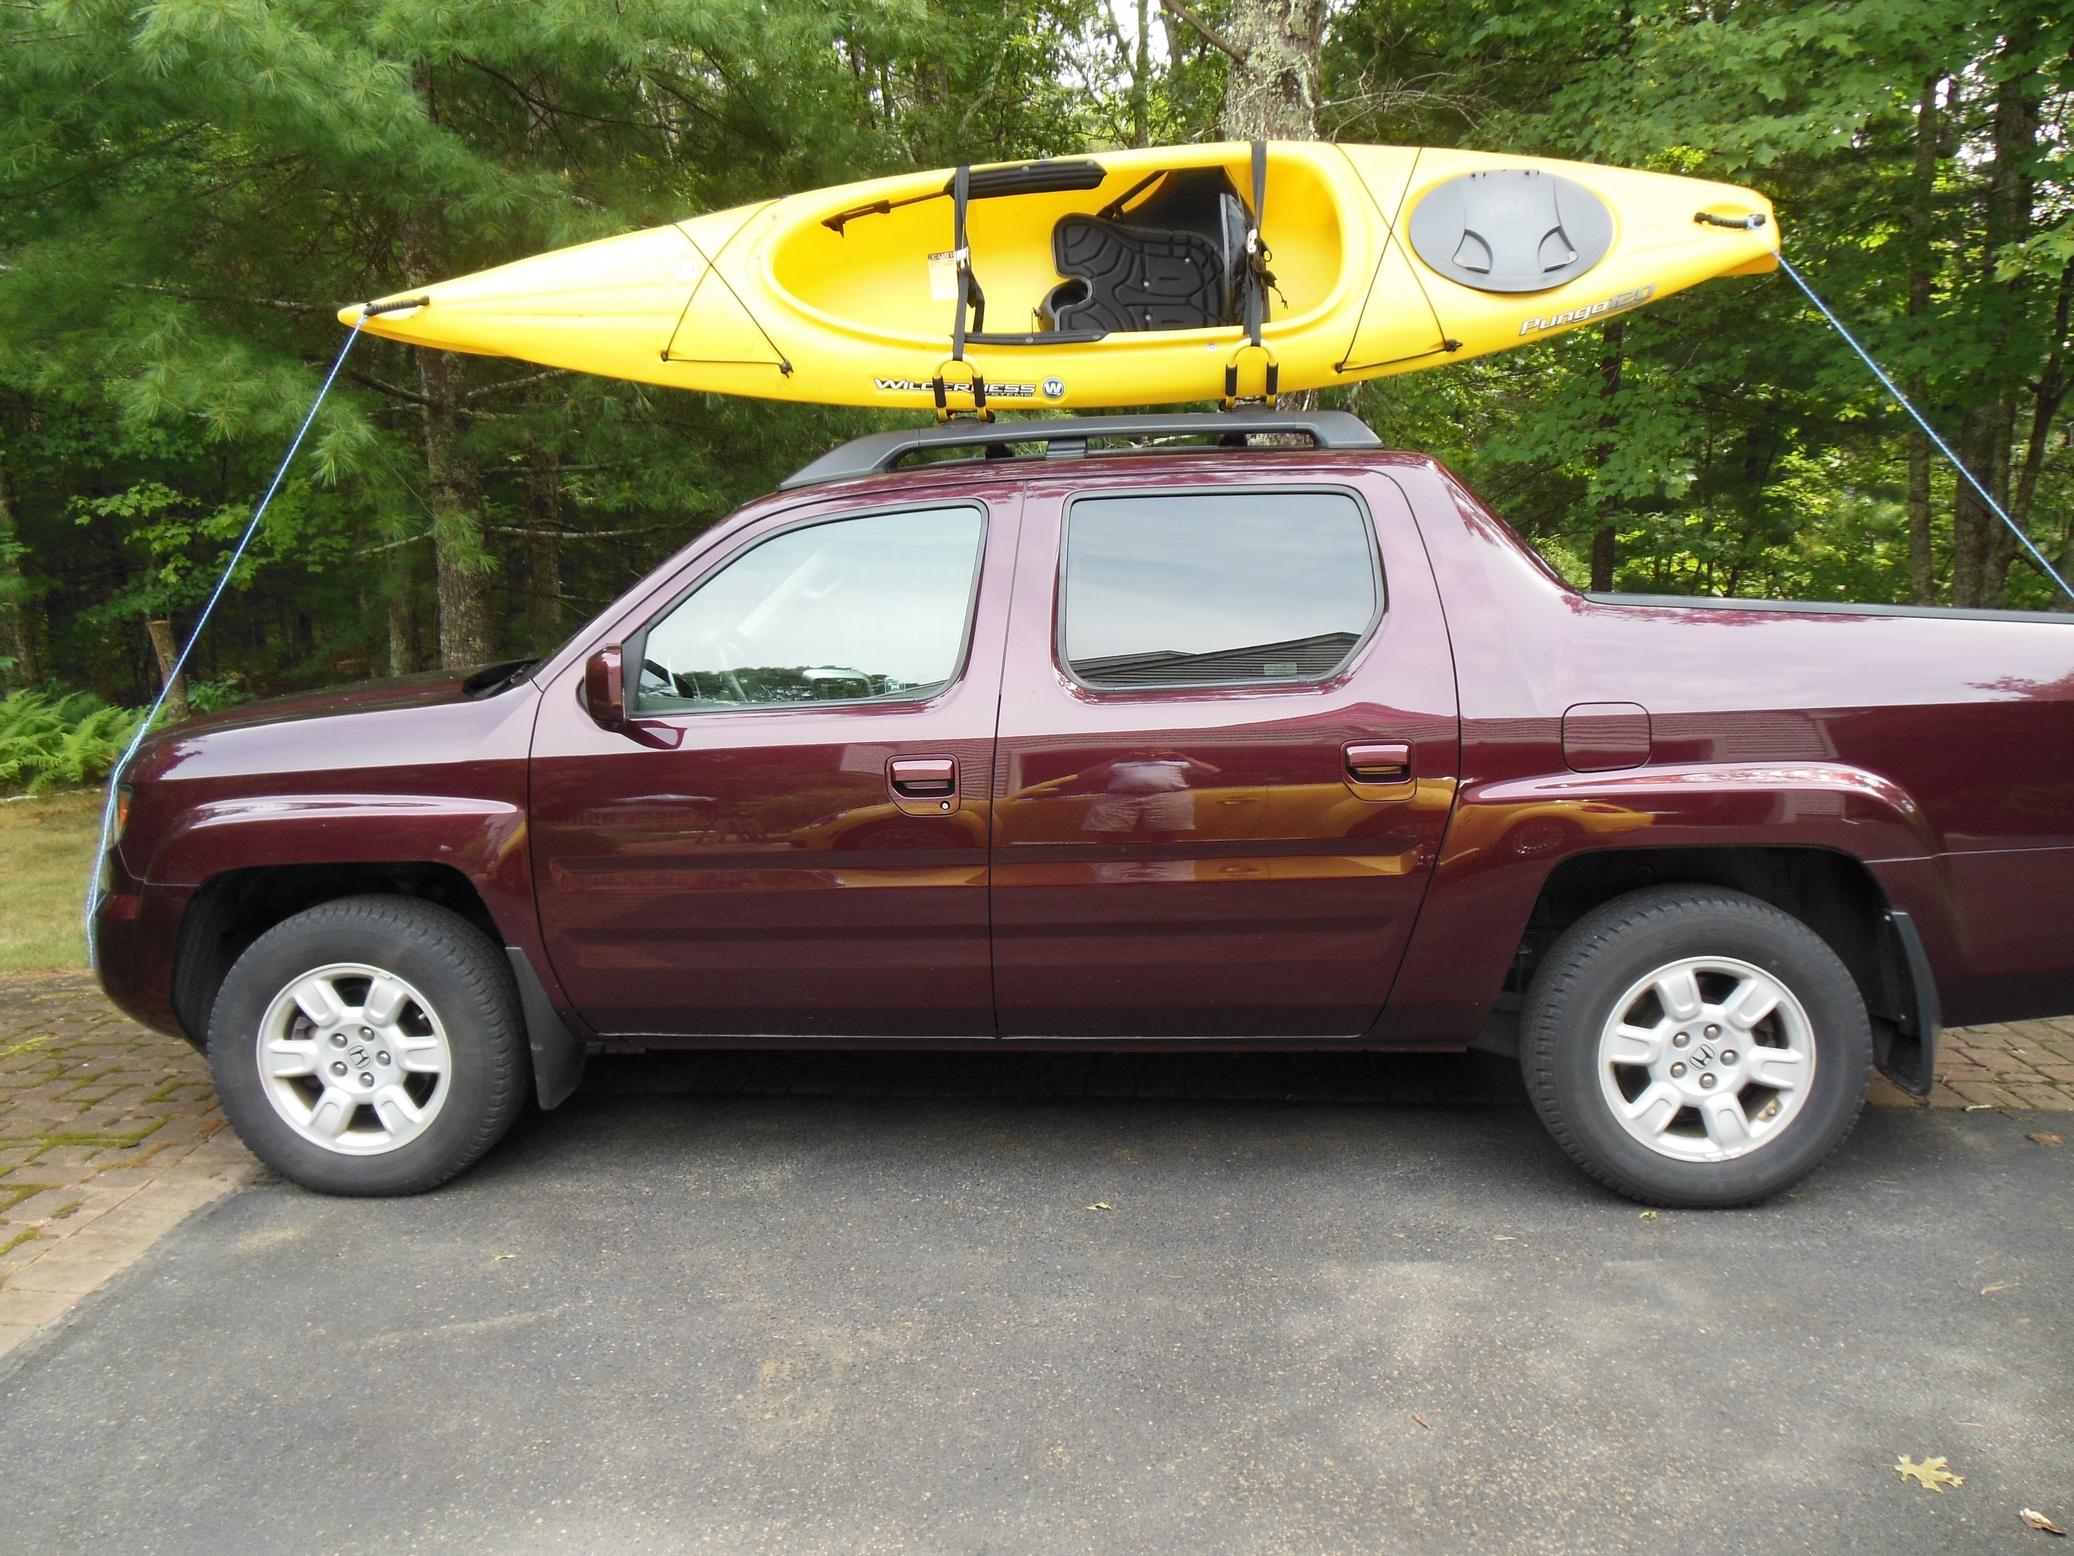 bowdown kayak main outdoorplay com car down folding rack bow yakima frontdown roof